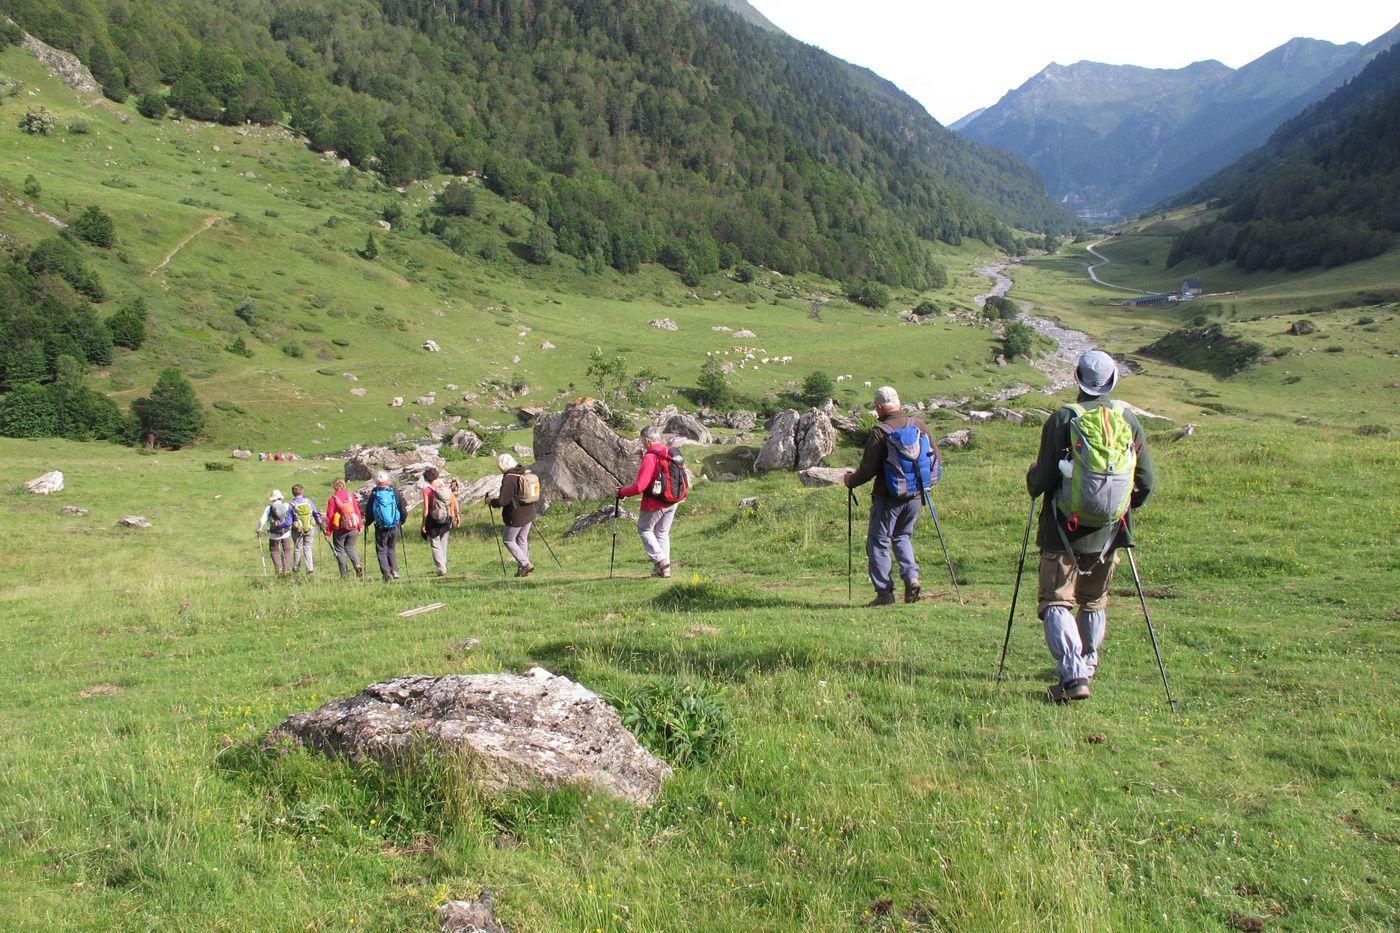 Séjour en vallée d'Ossau - Jour 2, groupe 2